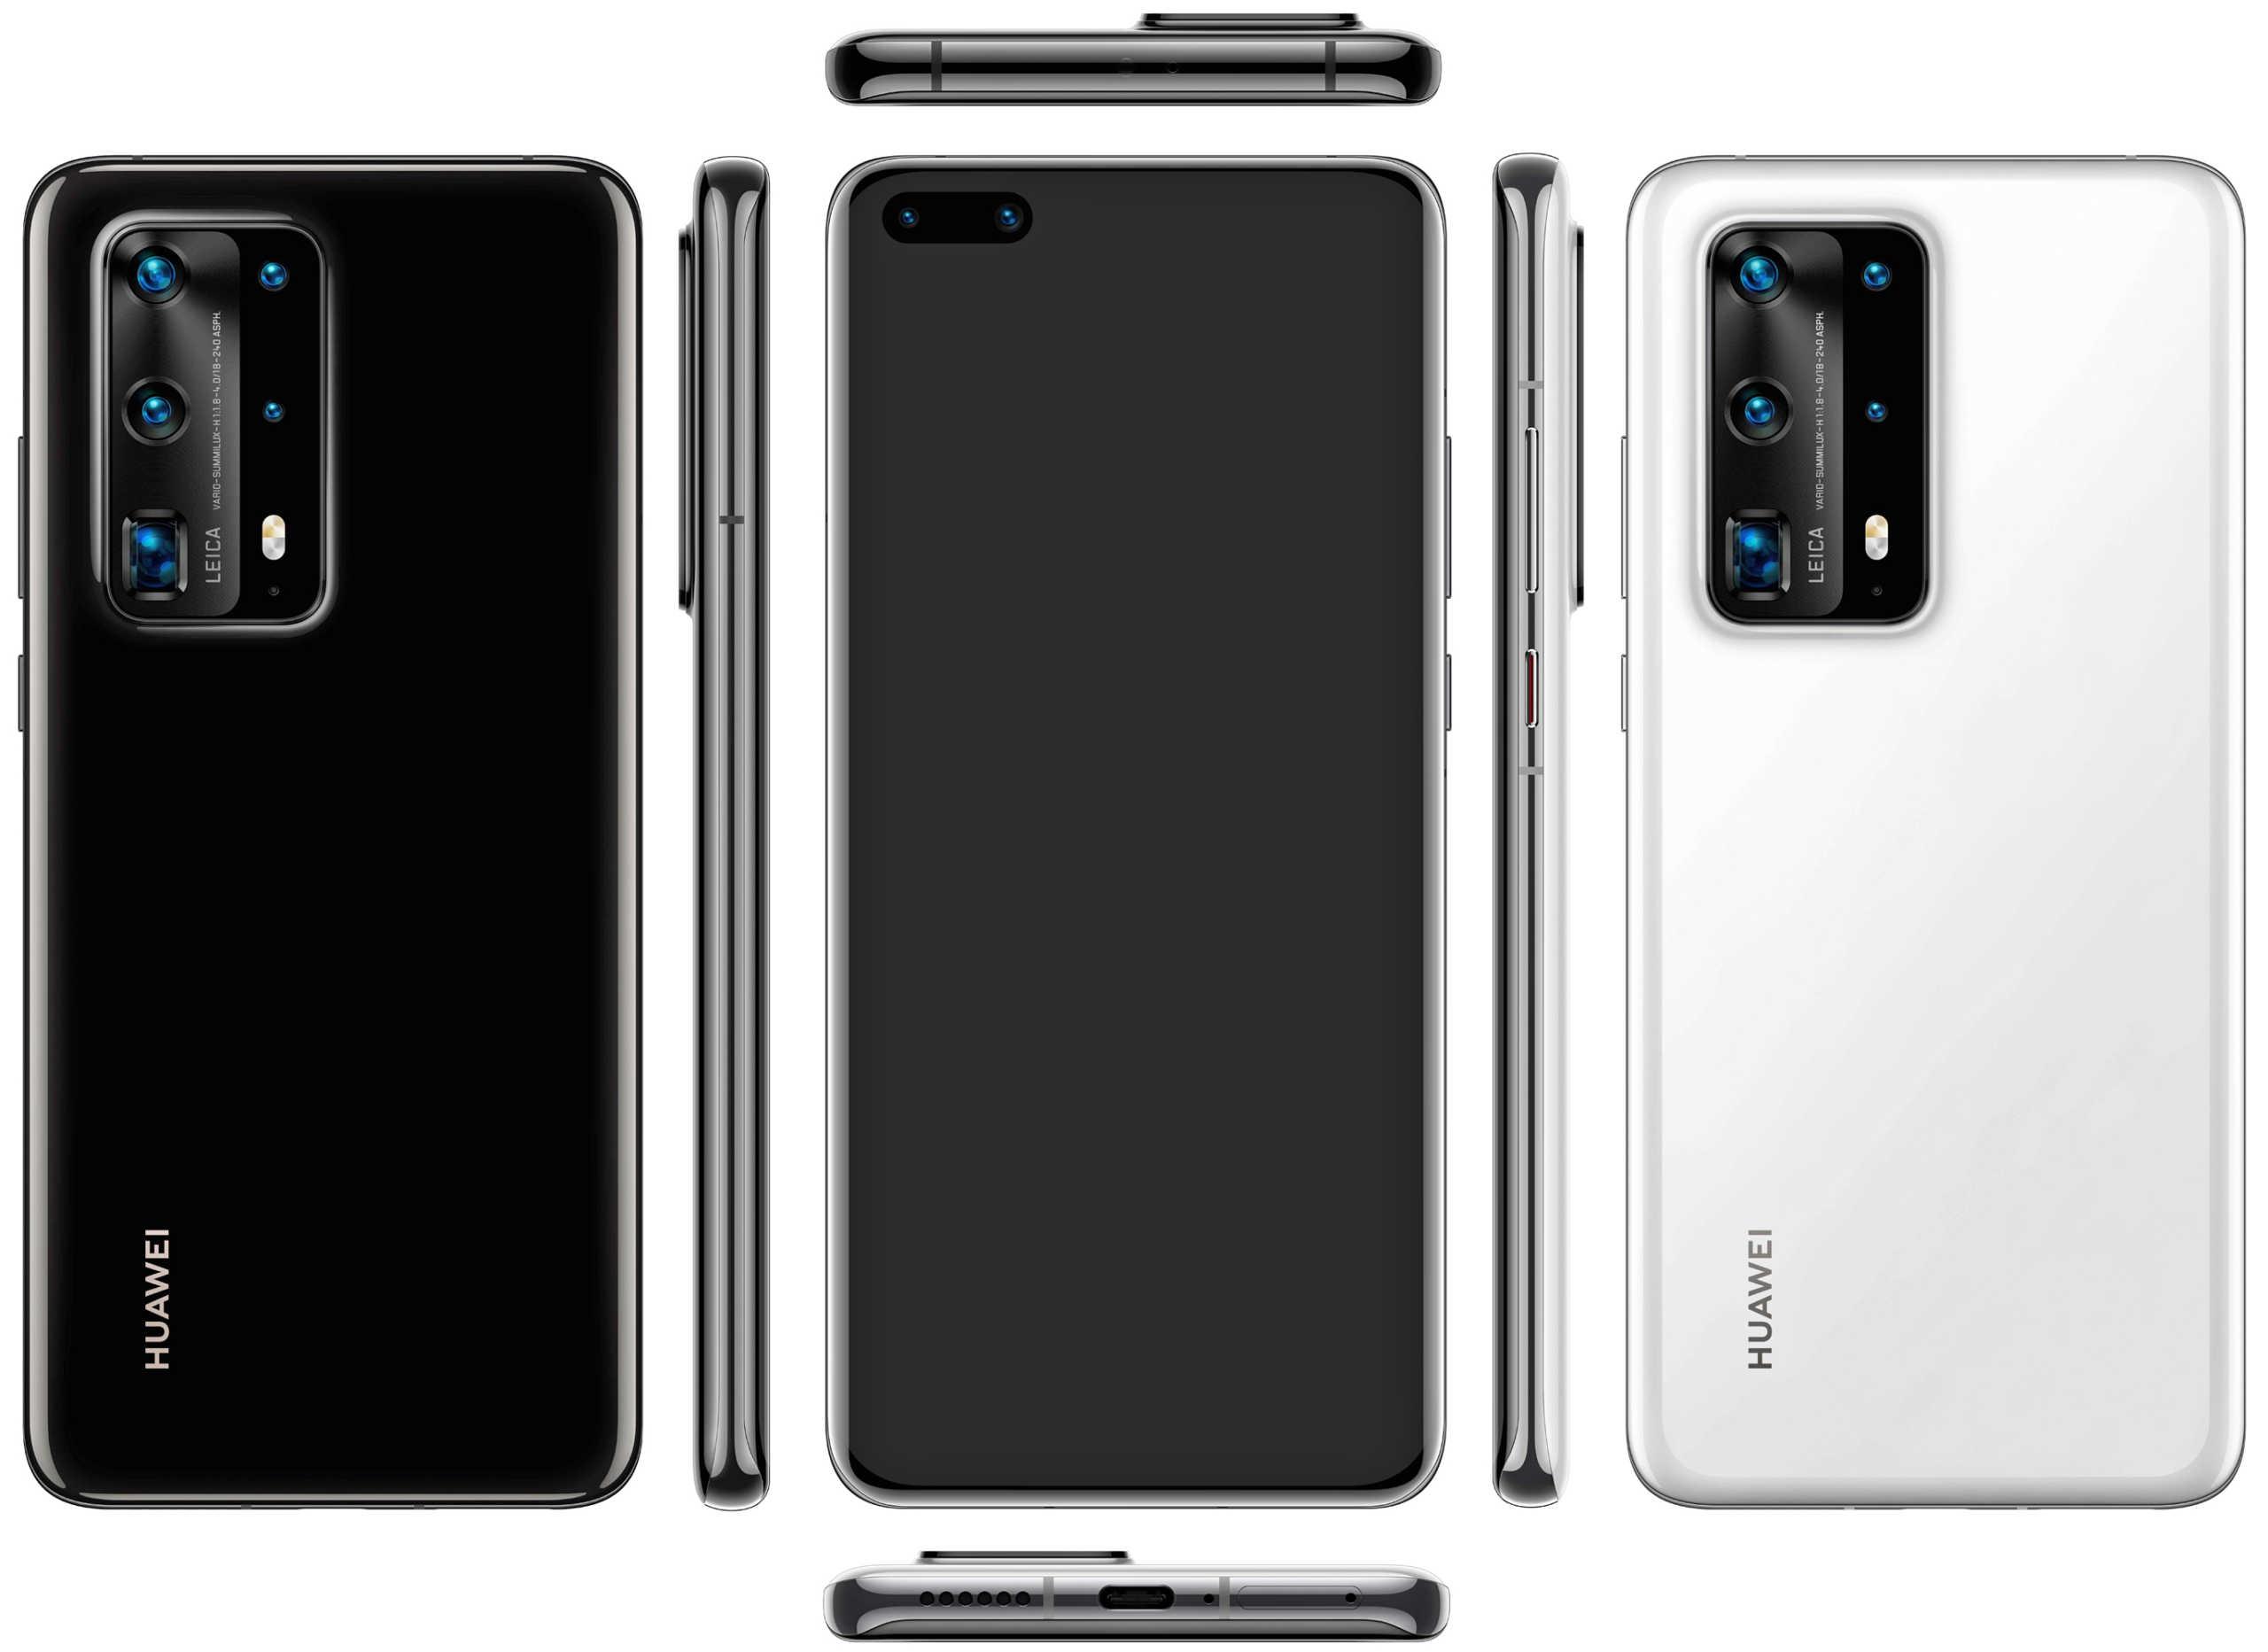 Huawei P40 PRO imagine presa clona GALAXY S20